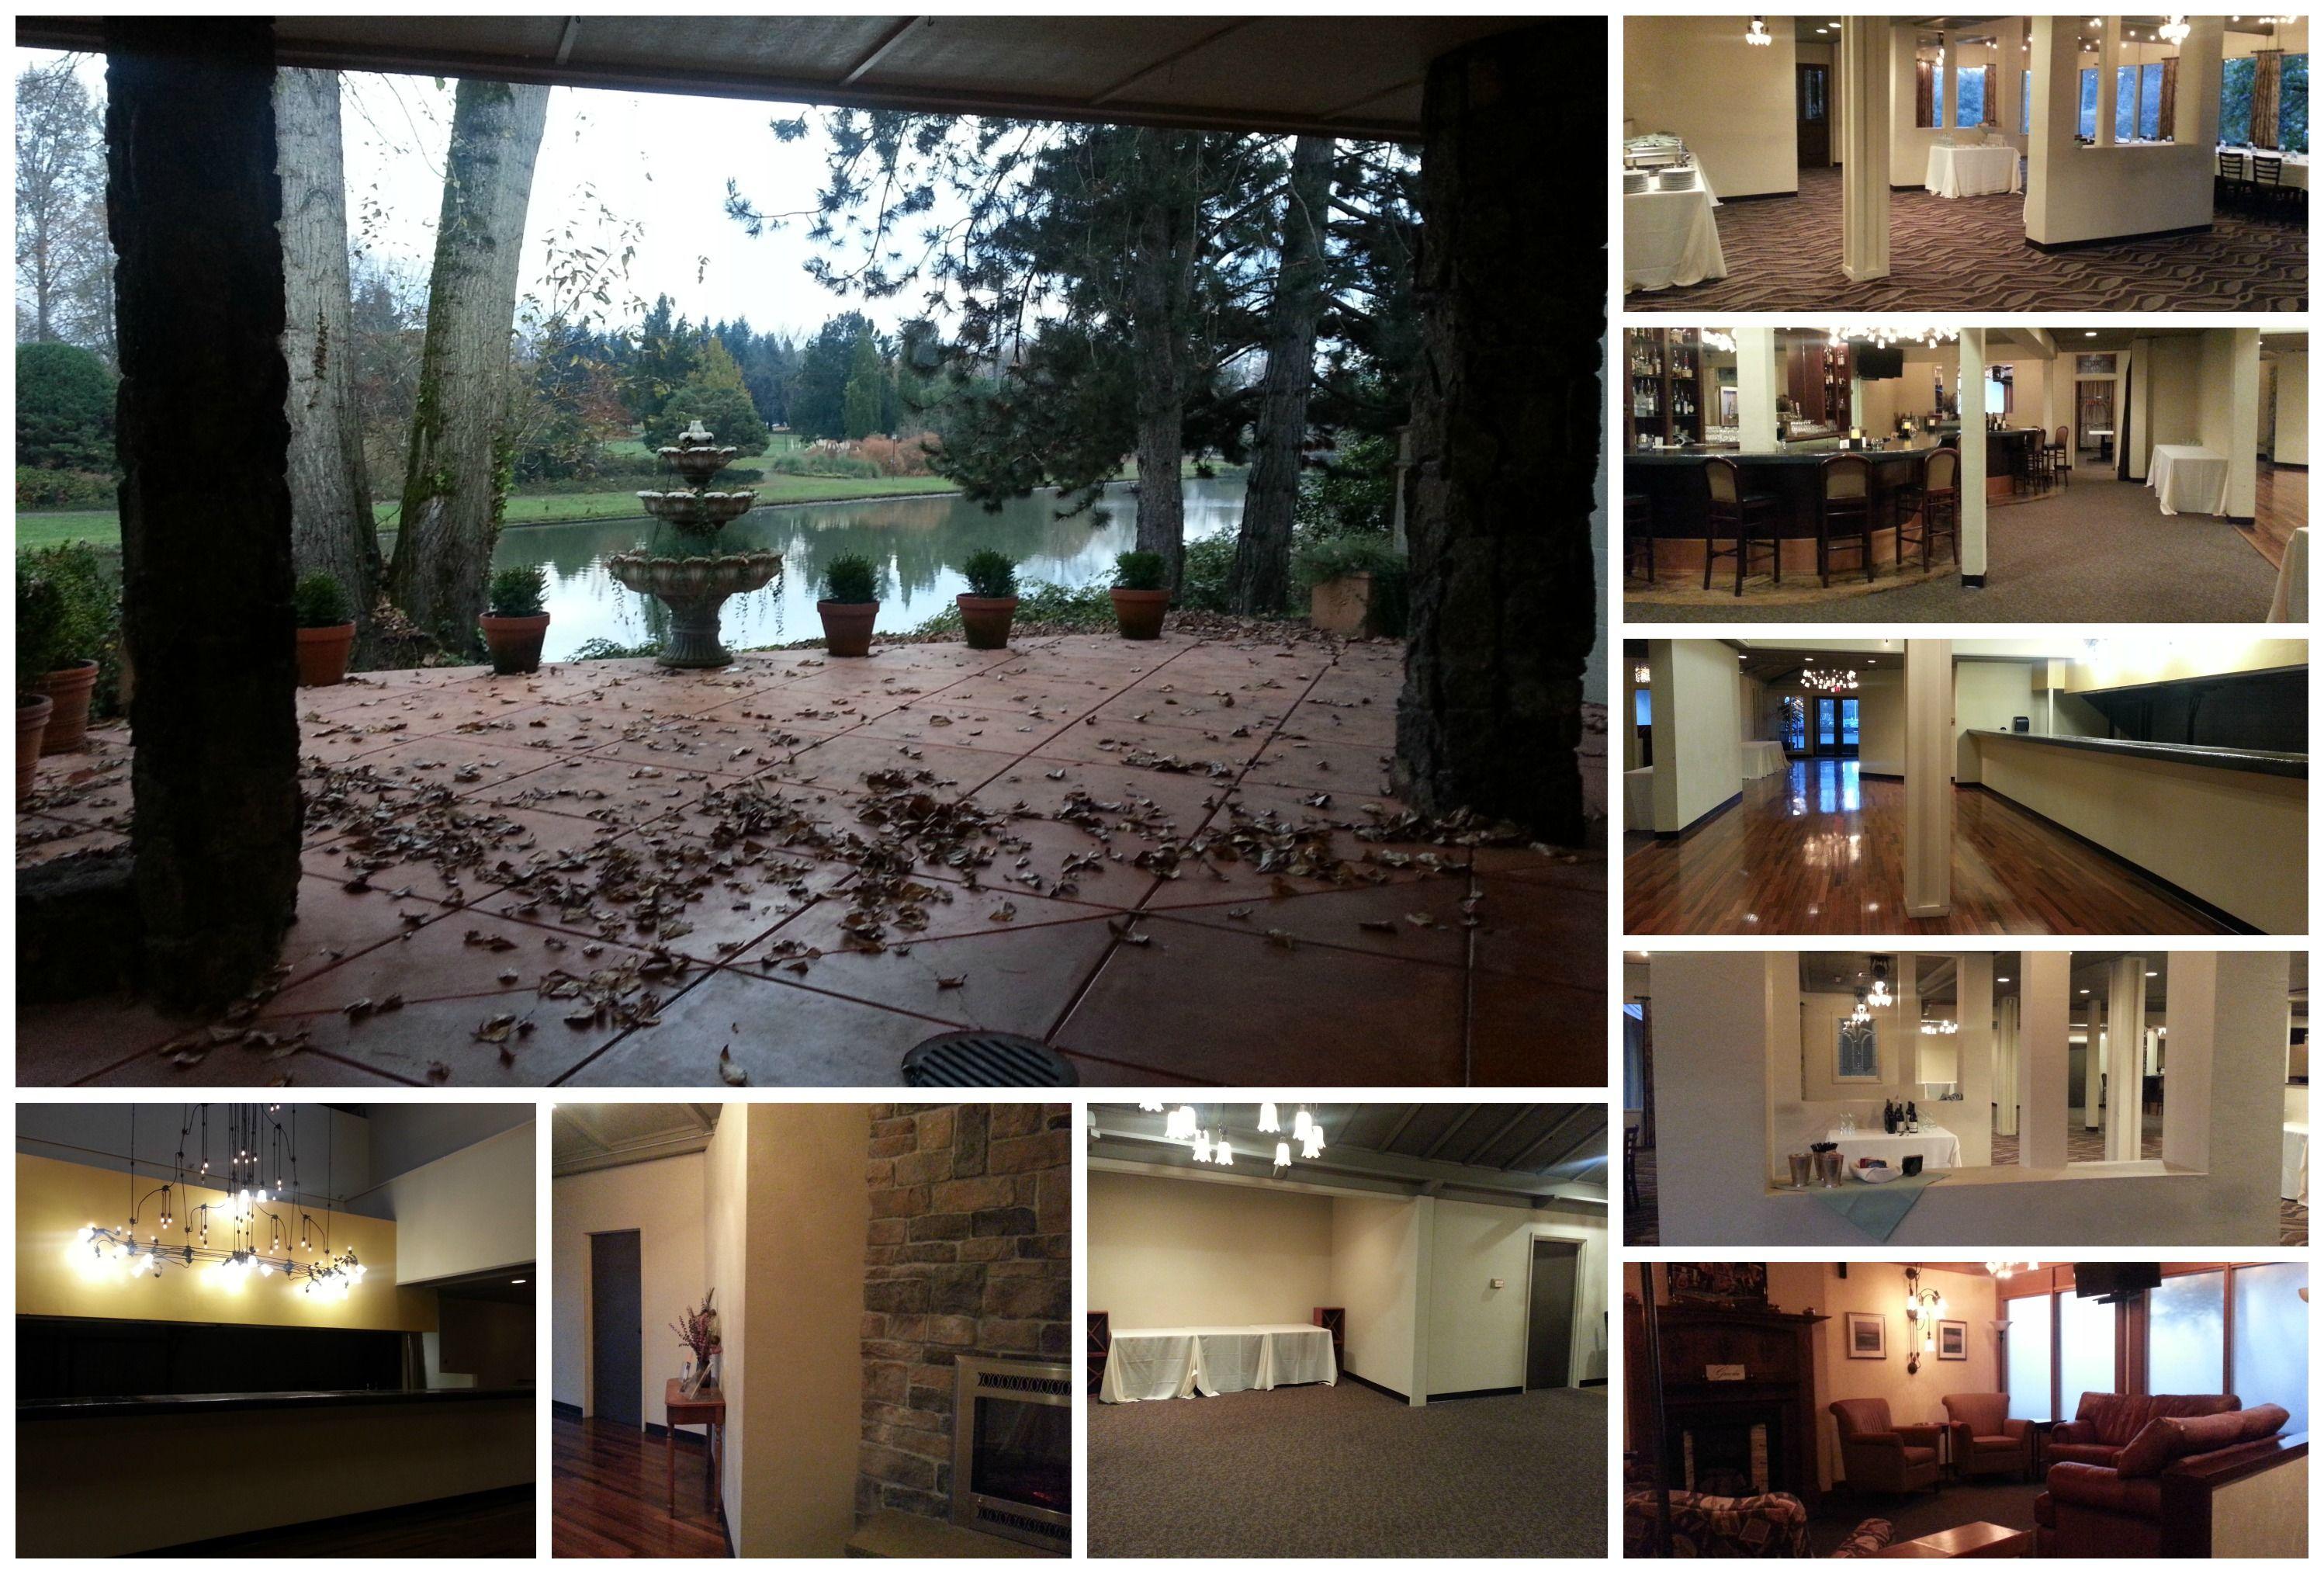 Pics of the Lewis & Clark Venue